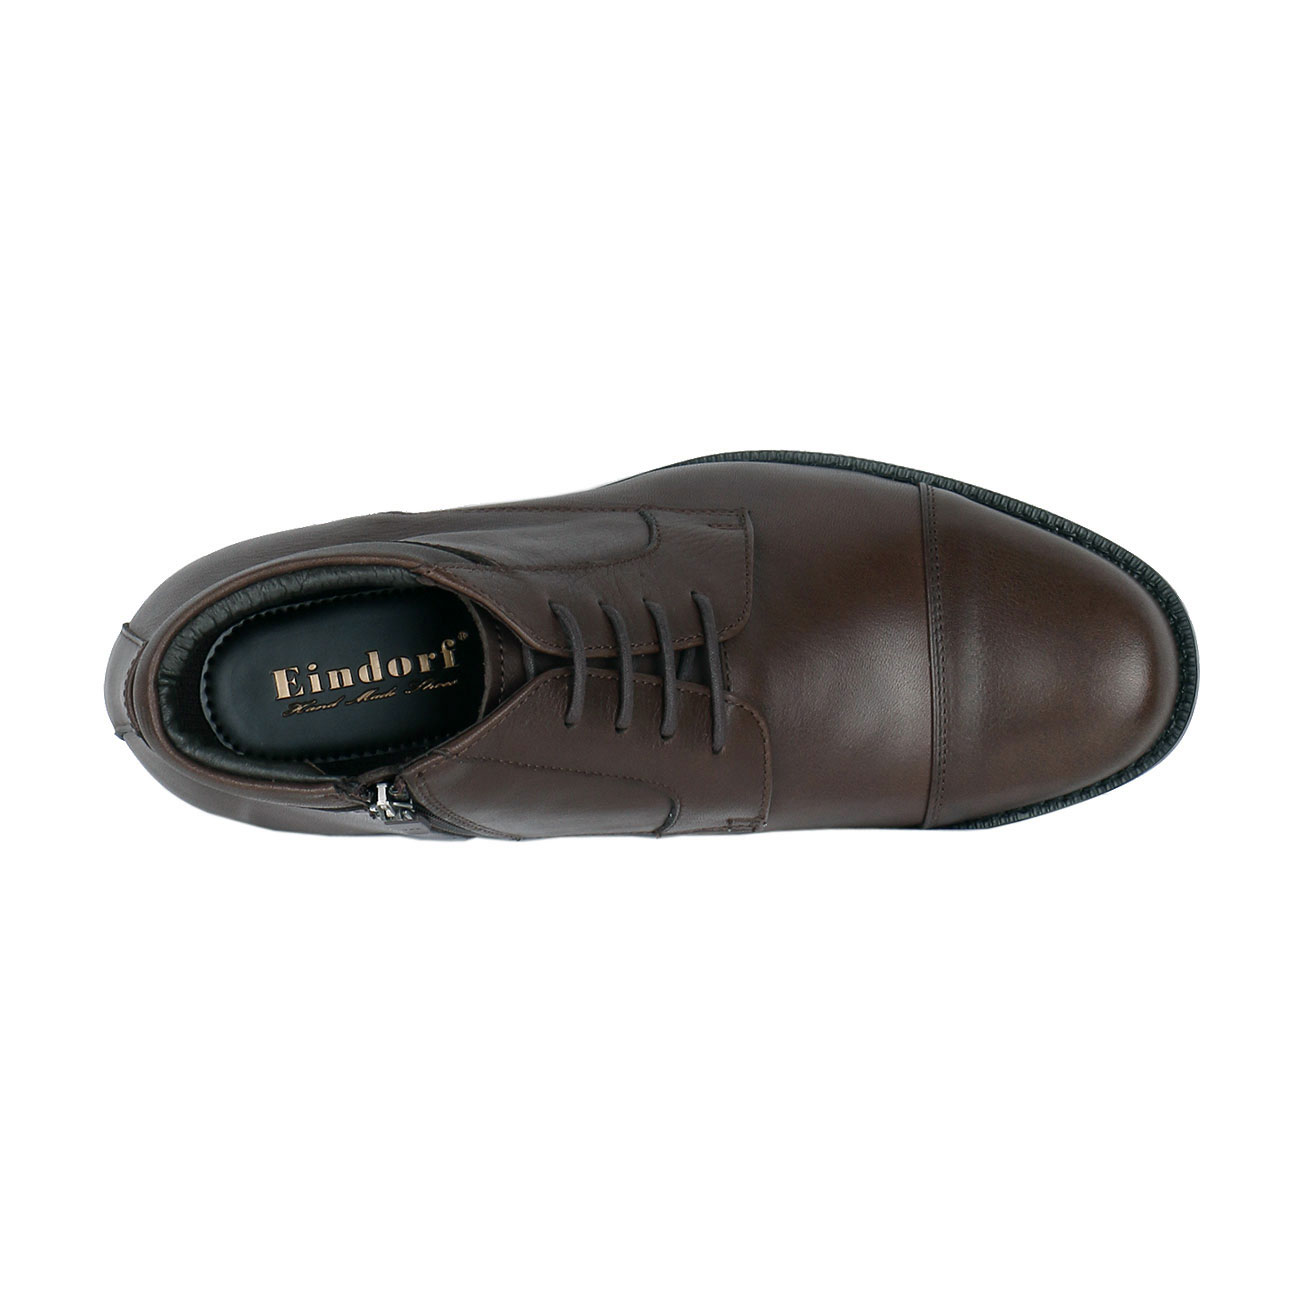 Men's Leather Chukka Semi Dress Boot to Height Enhancing